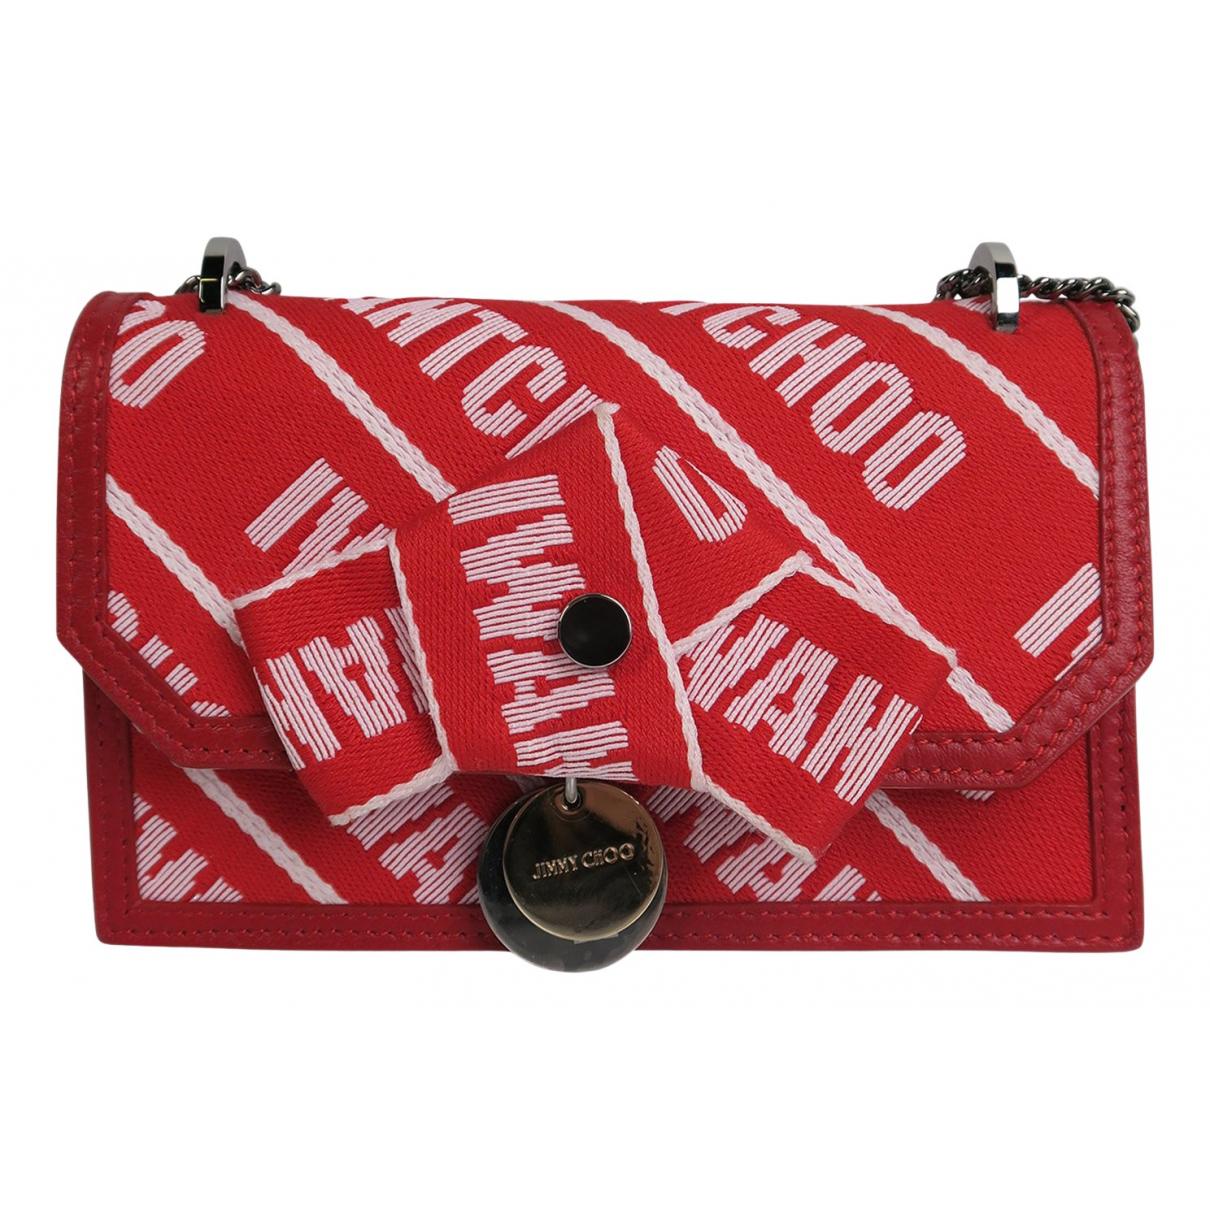 Jimmy Choo N Multicolour Cloth handbag for Women N